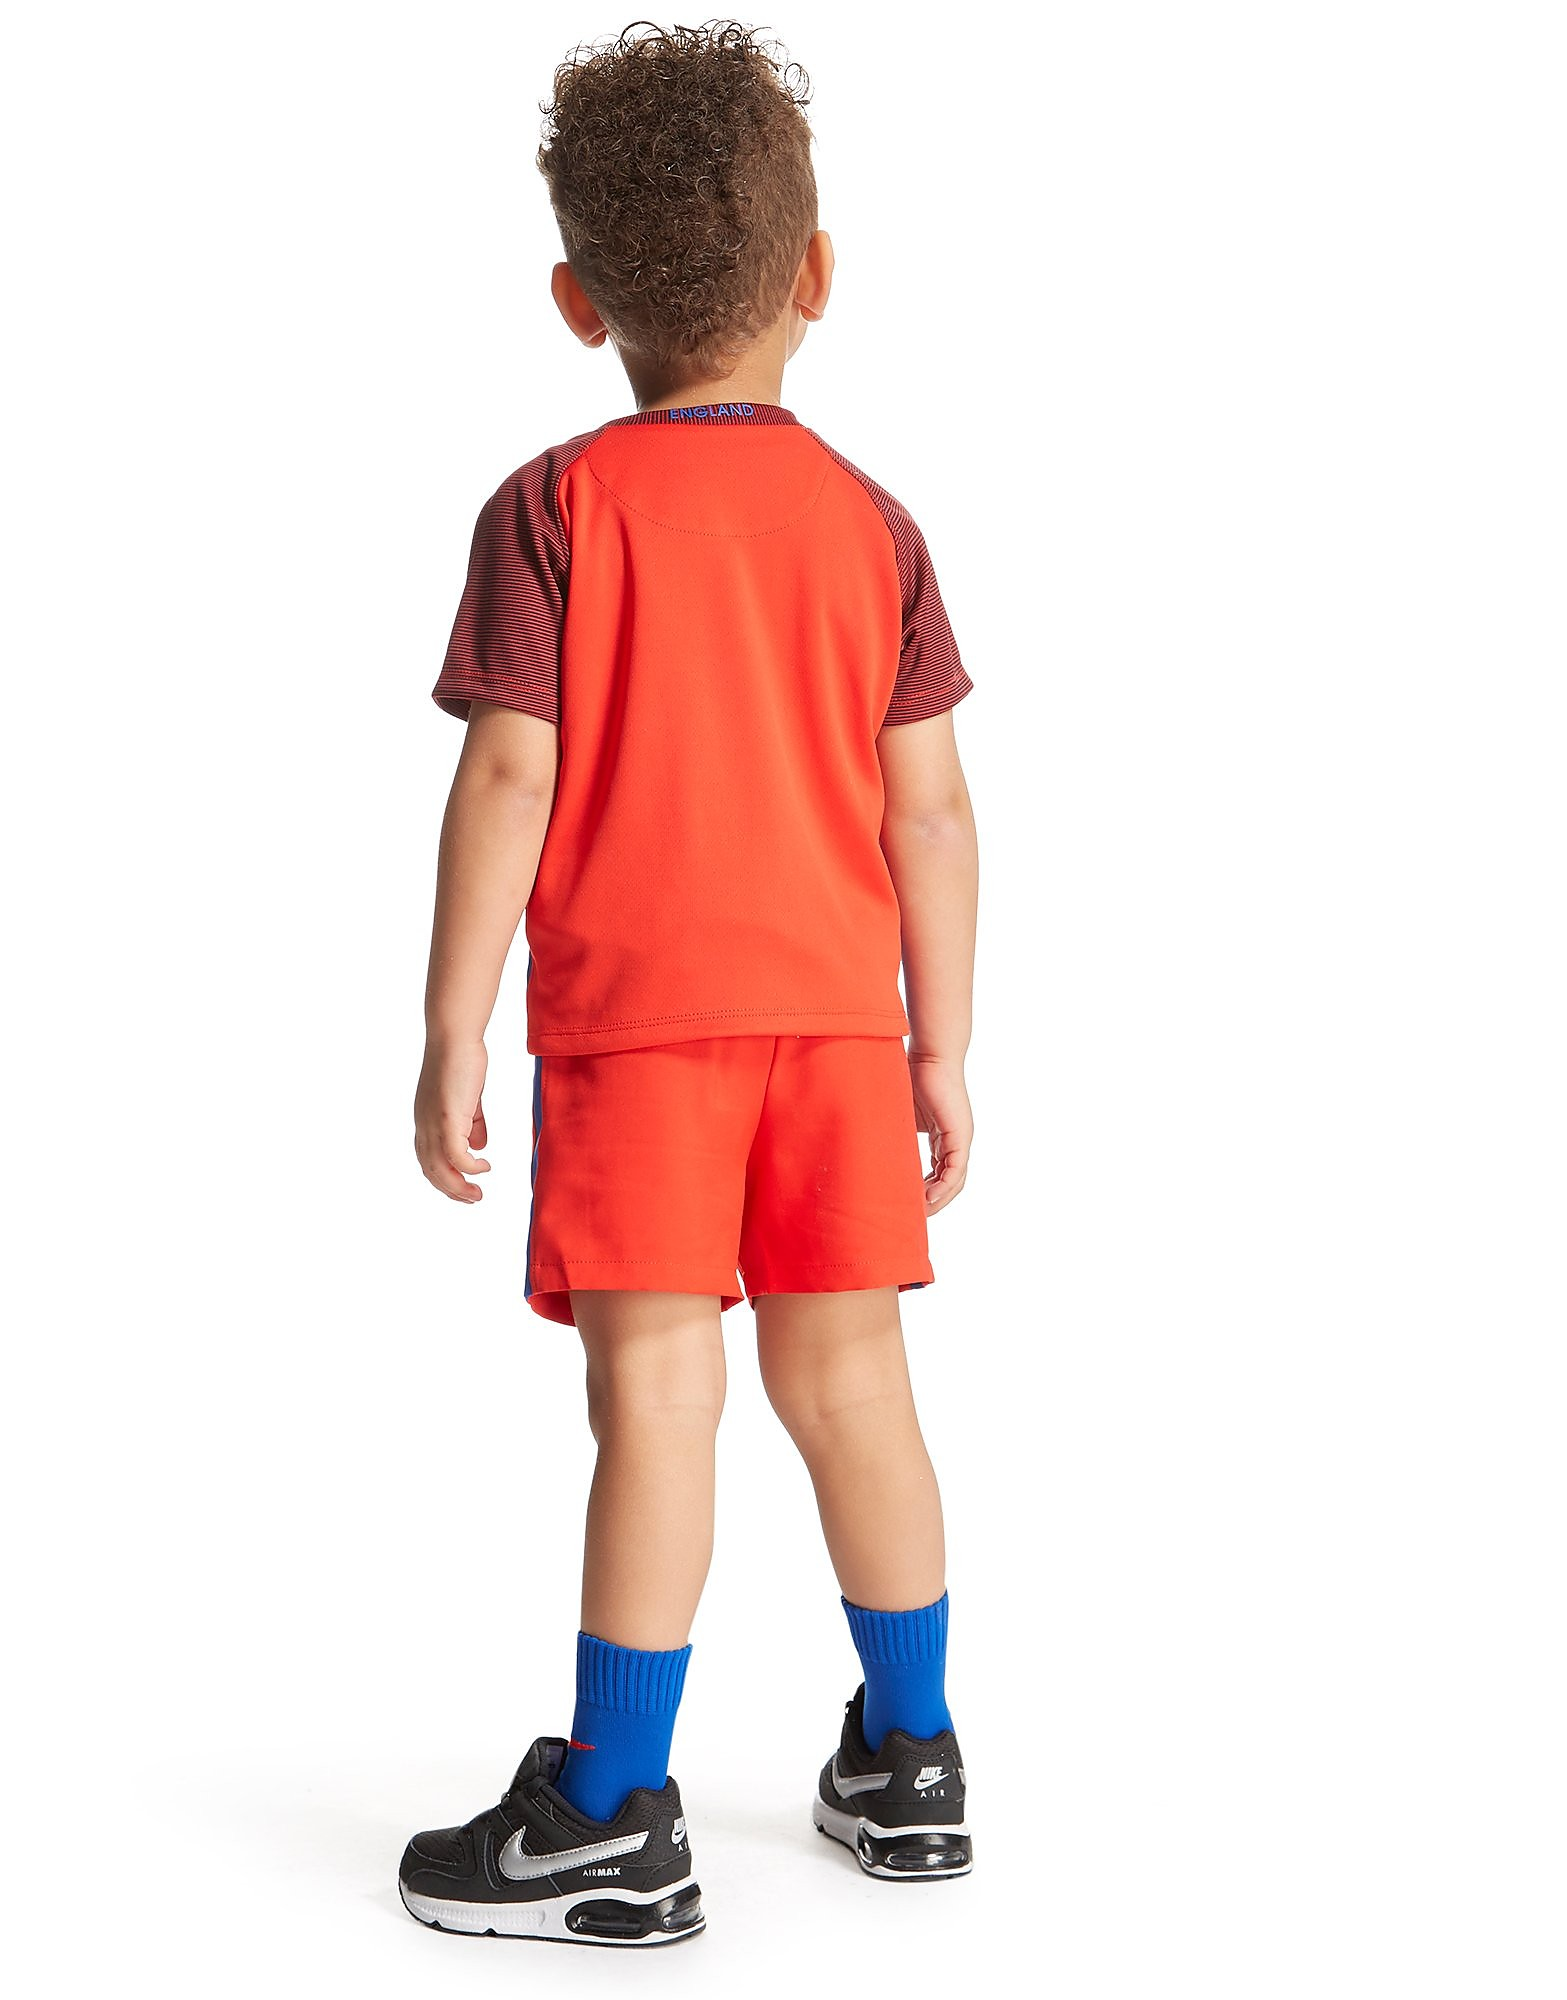 Nike Inglaterra 2016 Away Kit infantil